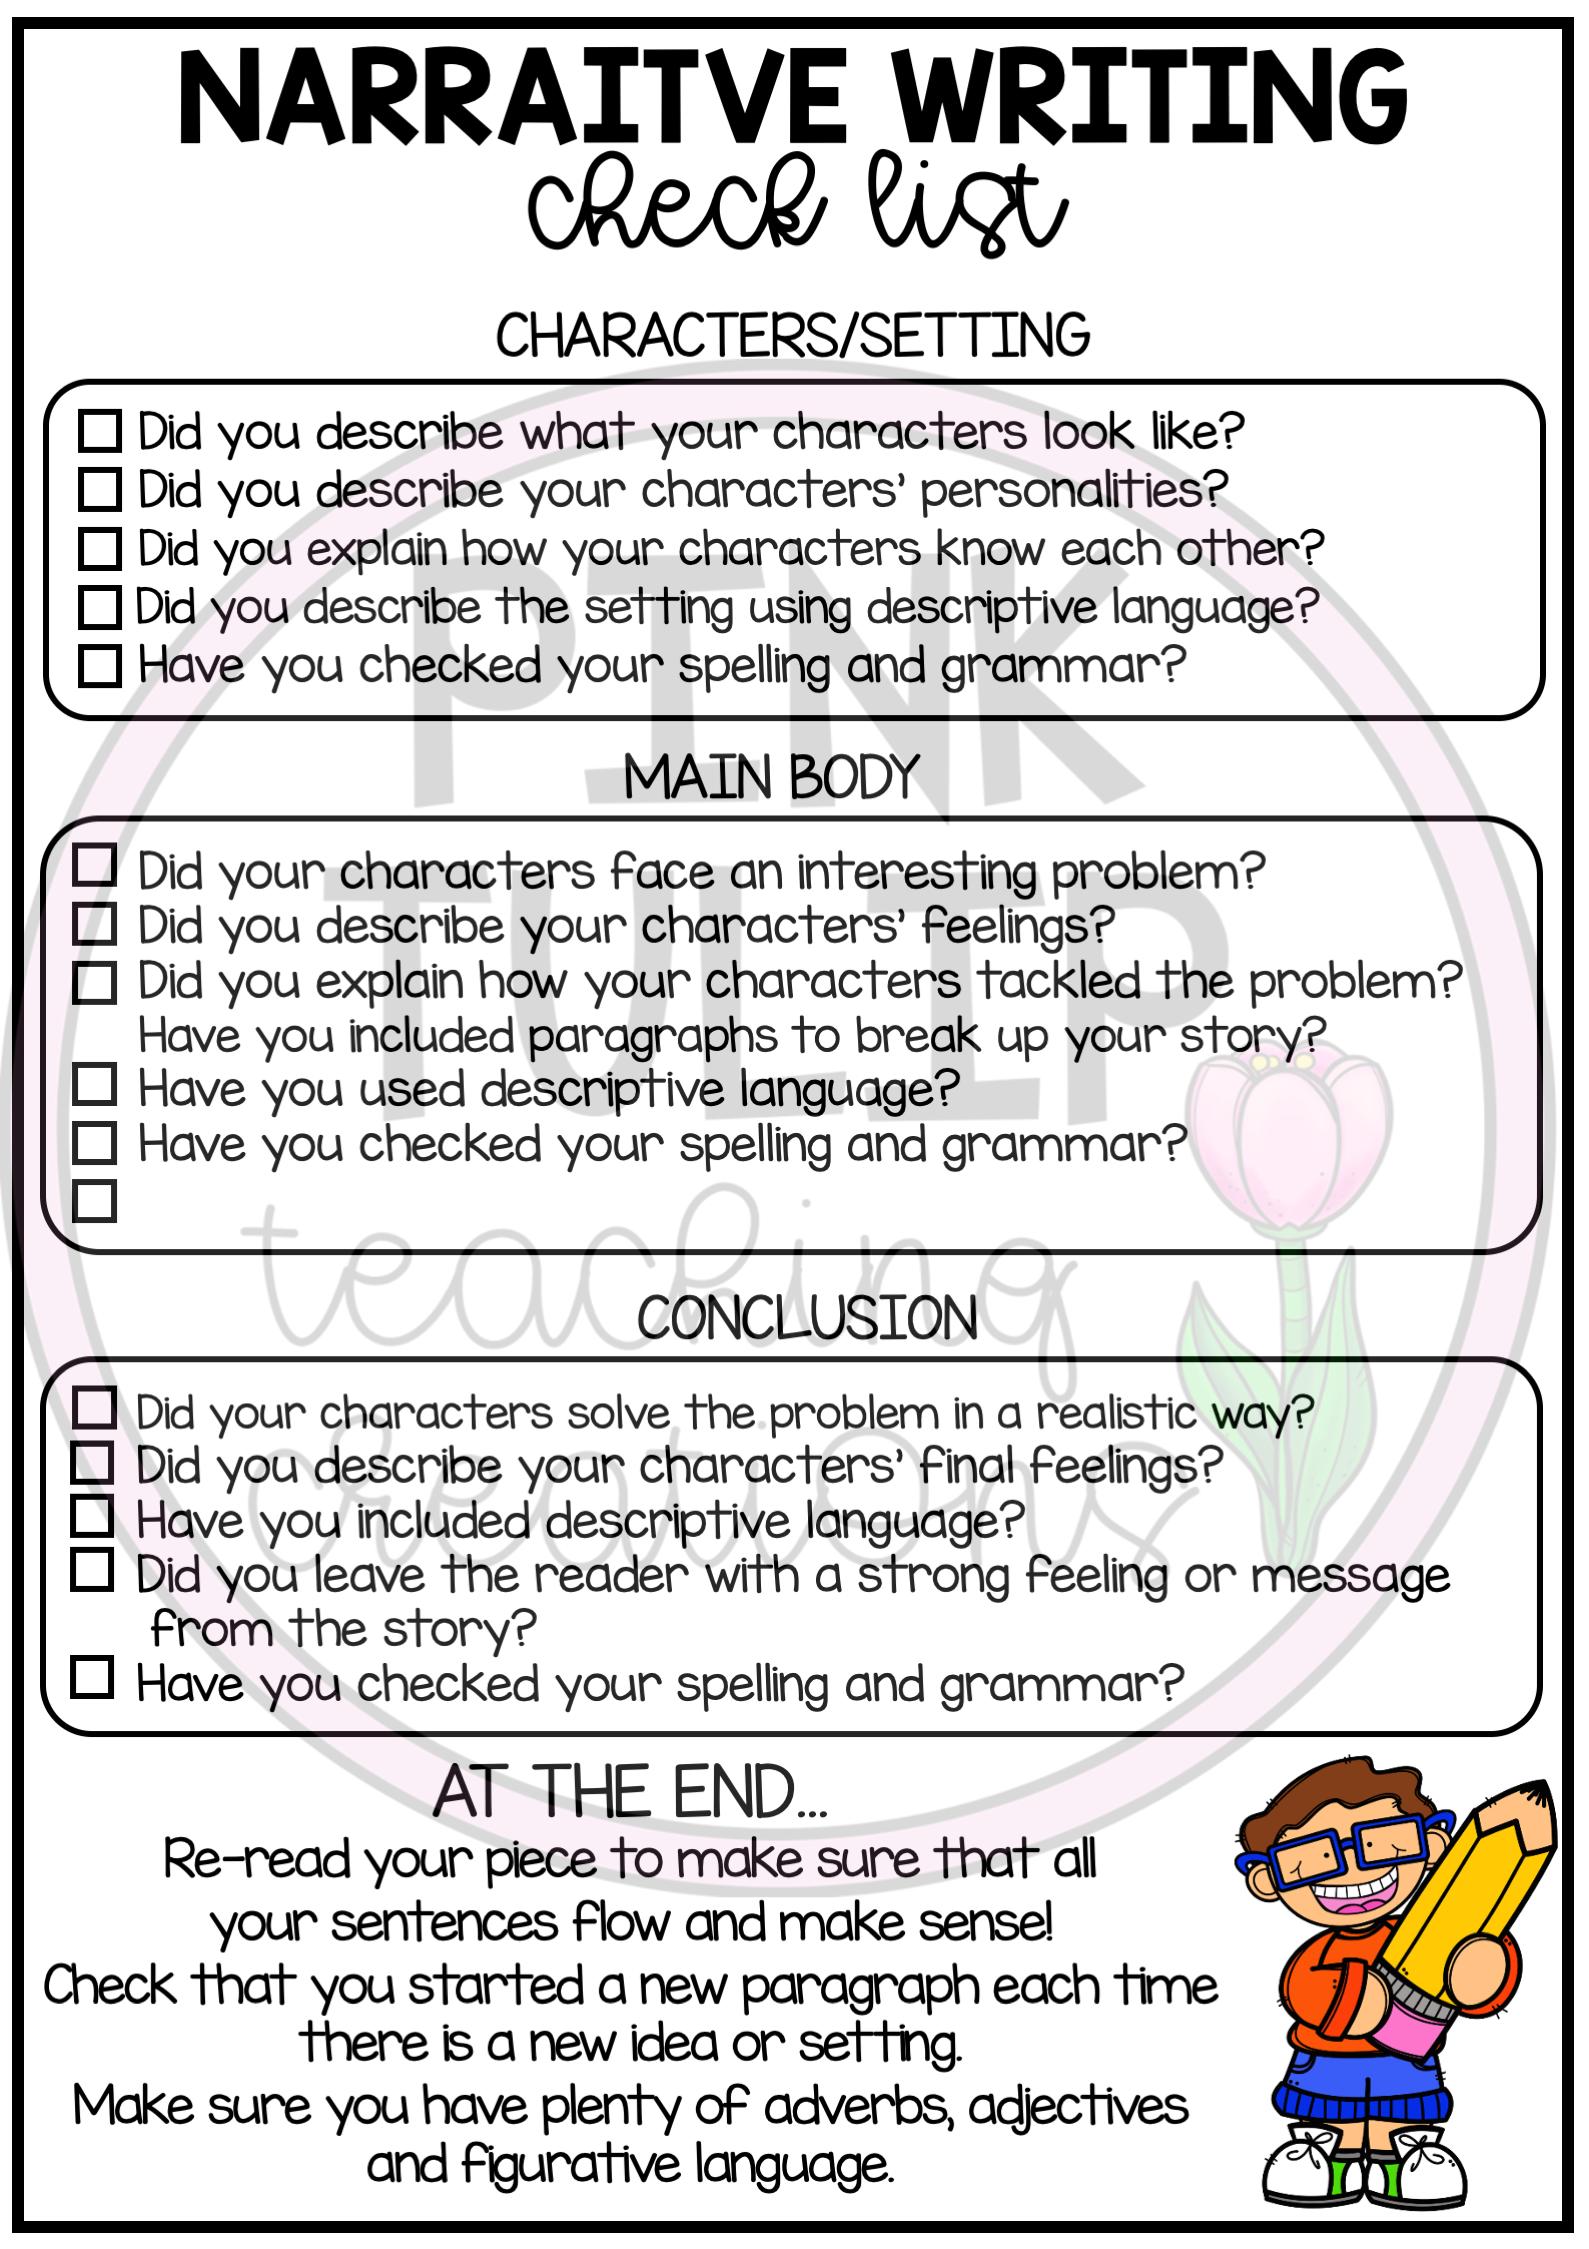 Narrative Writing Worksheet Pack No Prep Lesson Ideas Narrative Writing Narrative Writing Checklist Student Writing Samples [ 2249 x 1589 Pixel ]